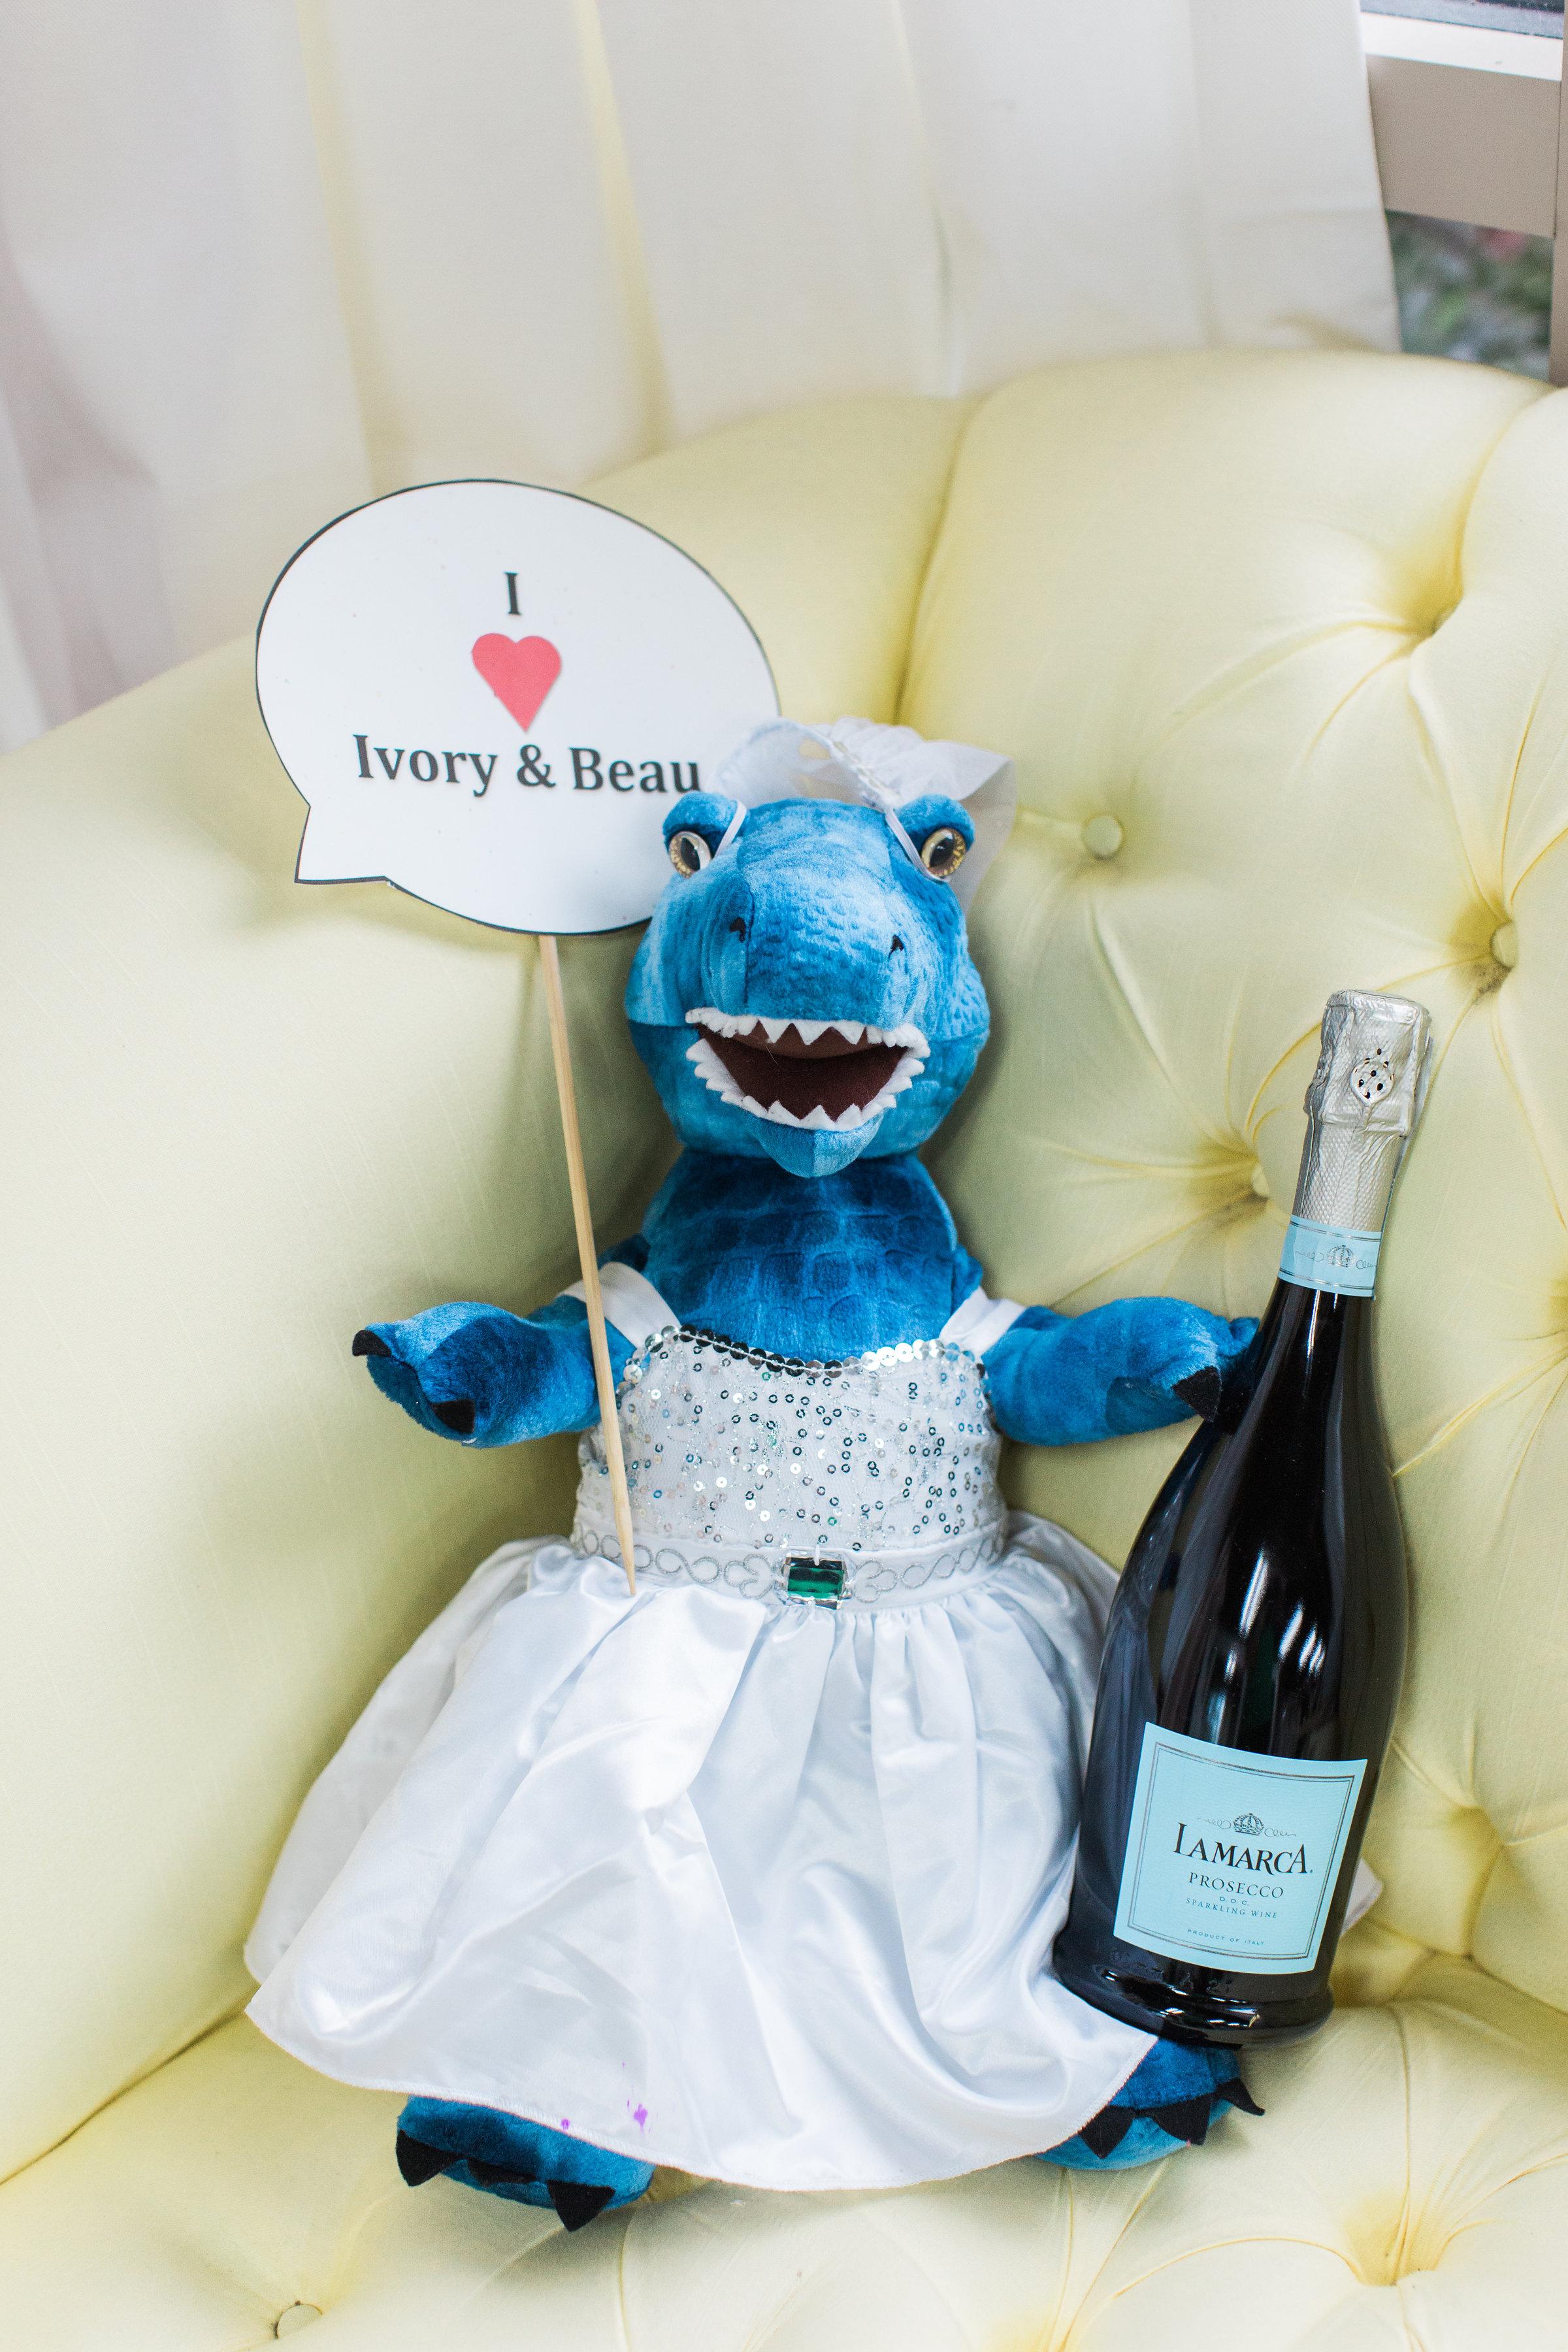 savannah-bridal-boutique-ivory-and-beau-savannah-bride-savannah-bridal-shop-wedding-dress-savannah-weddings-wedding-dress-savannah-aptbphotography-aptbphoto-veils-tiaras-bridal-jewelery-bridesmaids-dresses-bridesmaids-gowns-savannah-bridesmaids.jpg-17.jpg